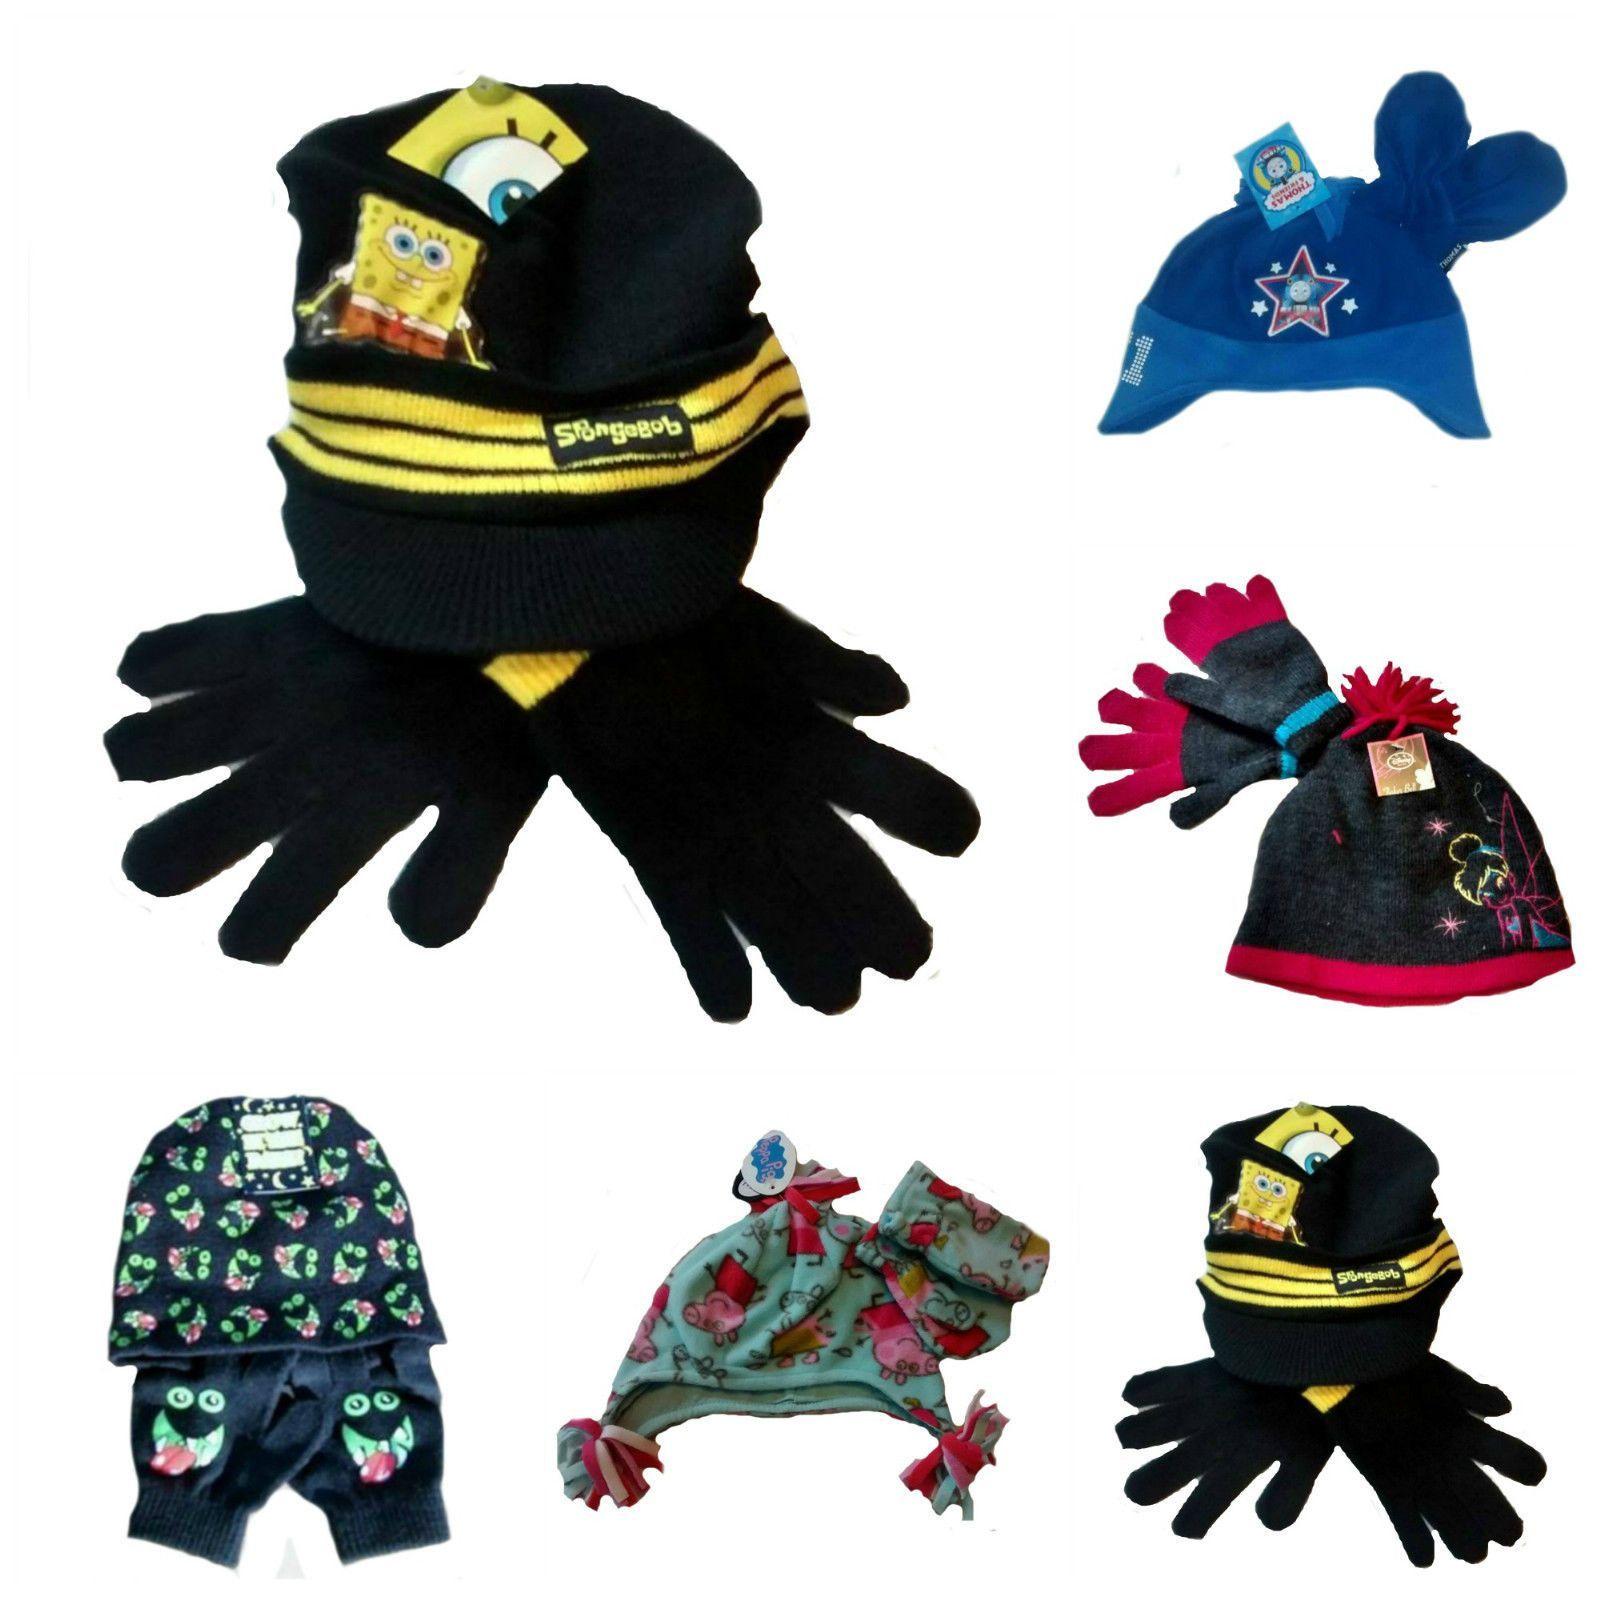 Boys Girls Baby Thomas Tinkerbell Peppa Spongebob age 2-8 mittens gloves hat